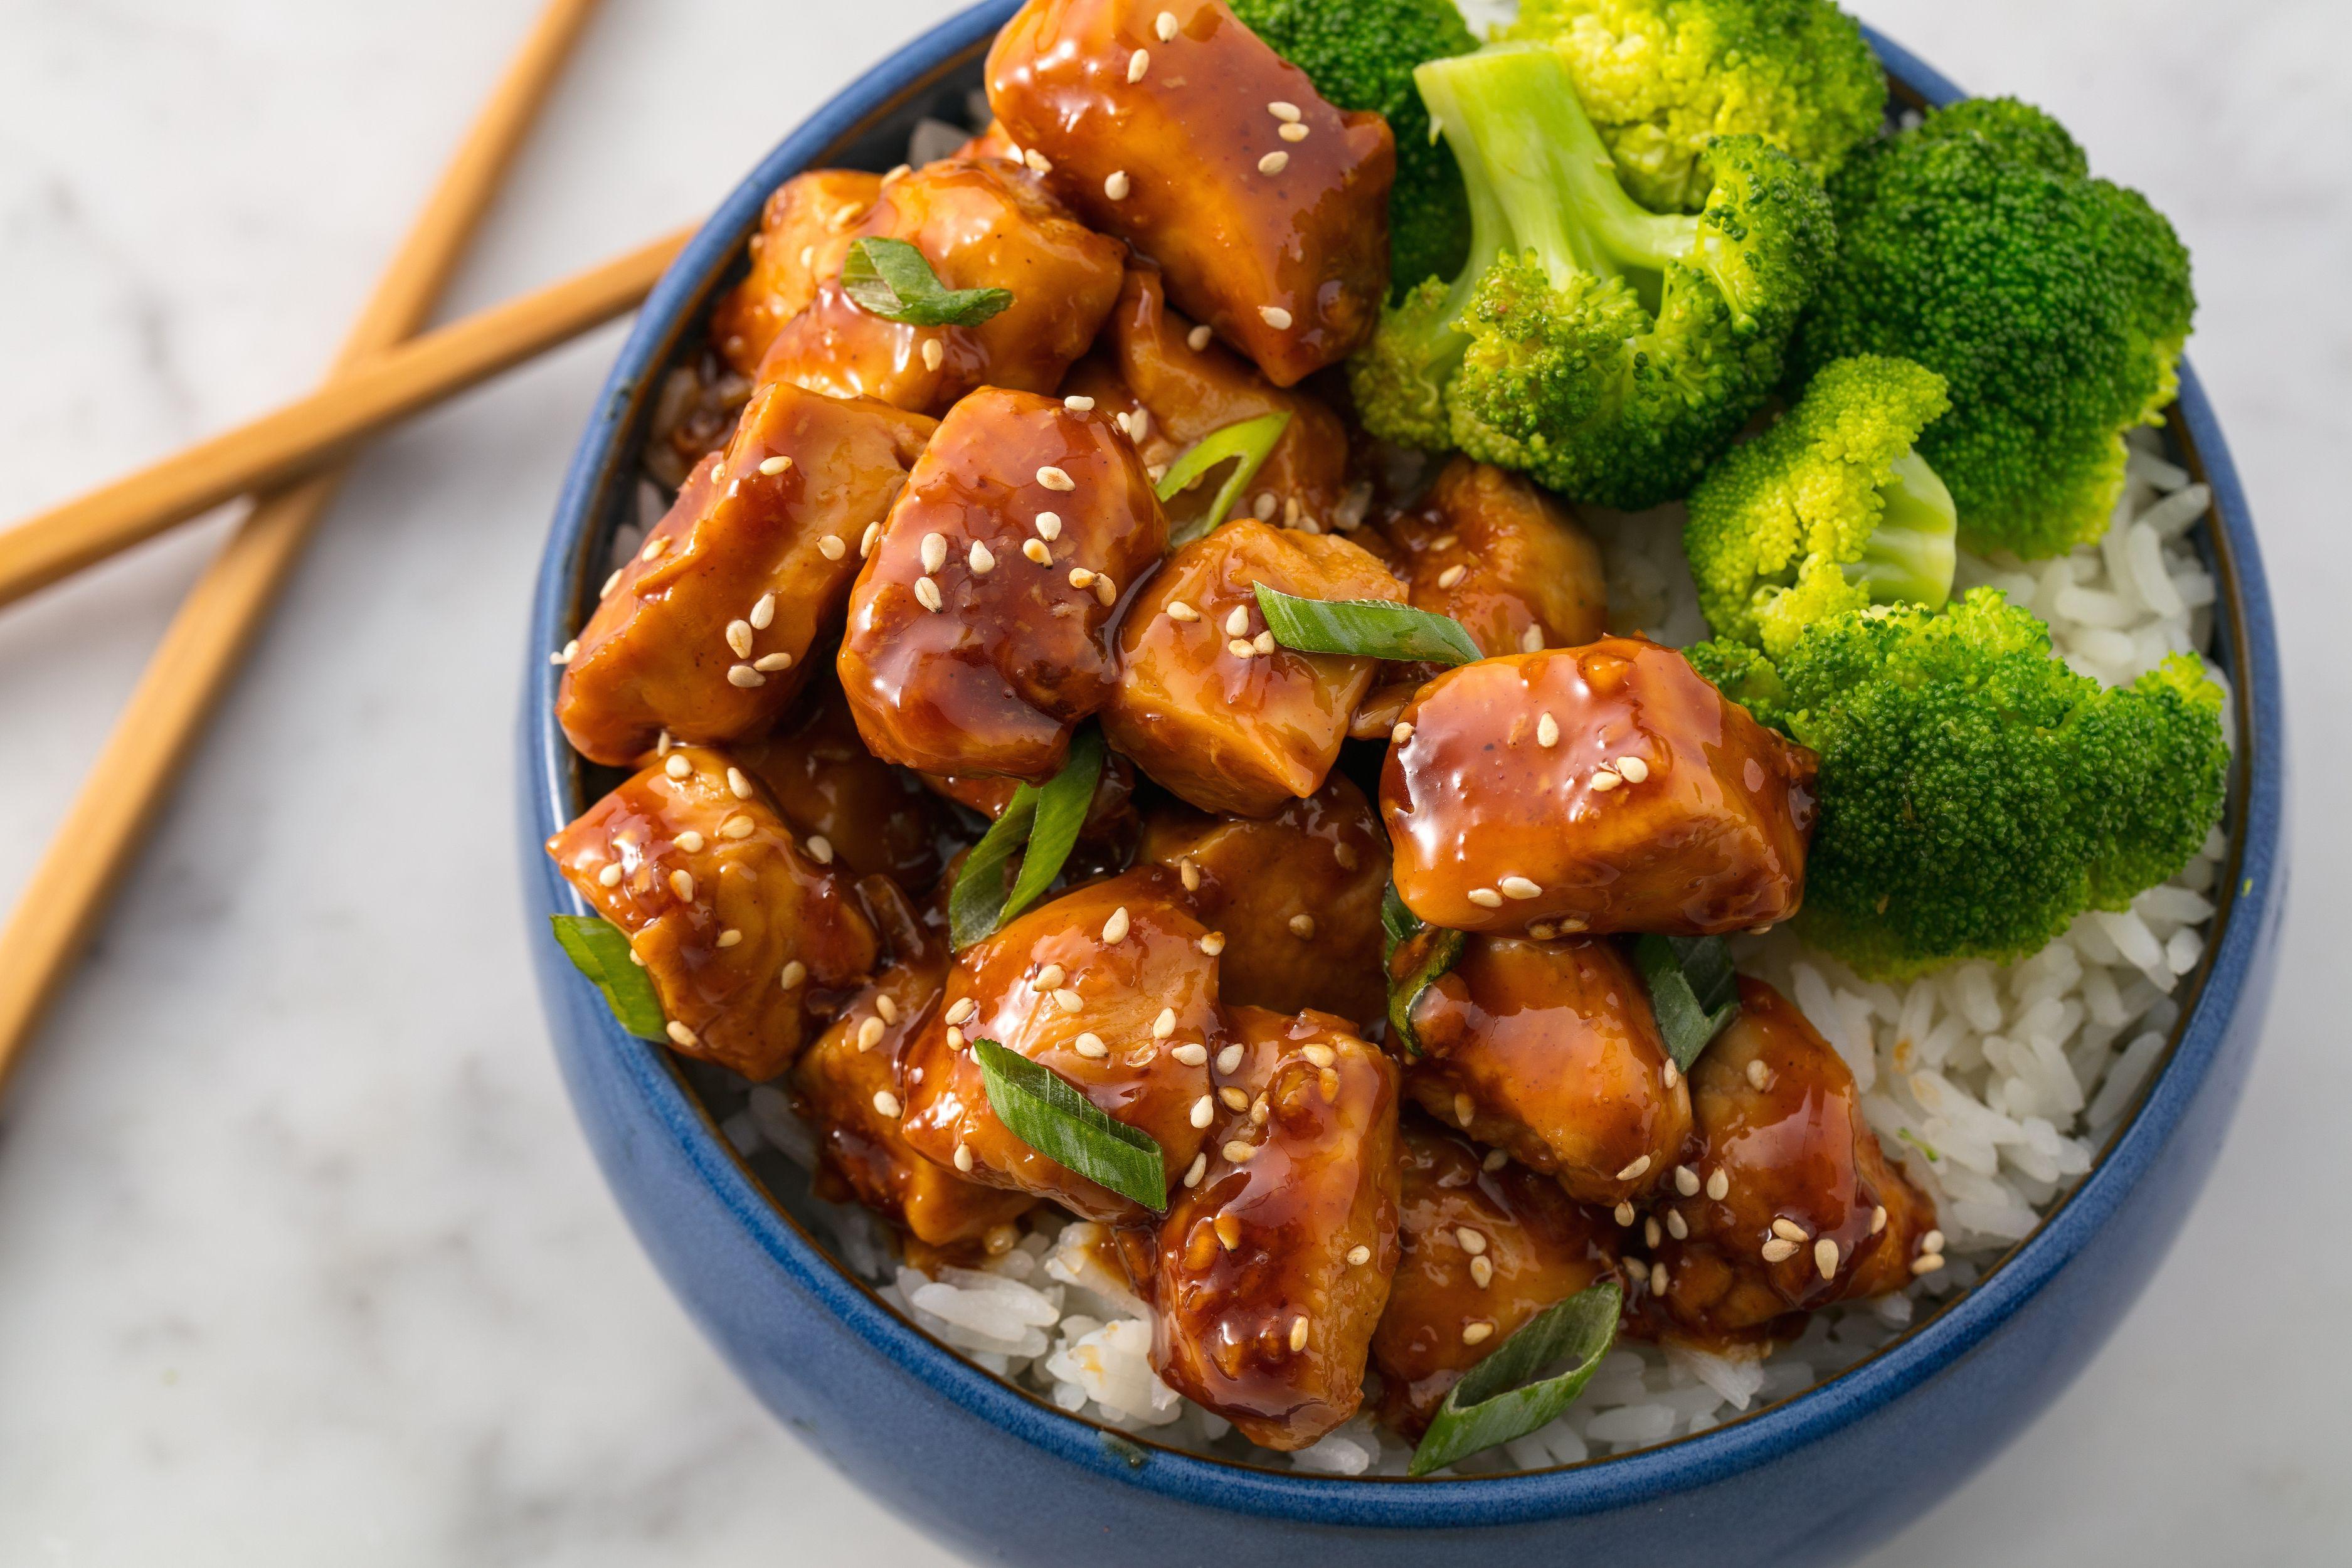 Easy Teriyaki Chicken Recipe How To Make Honey Teriyaki Chicken